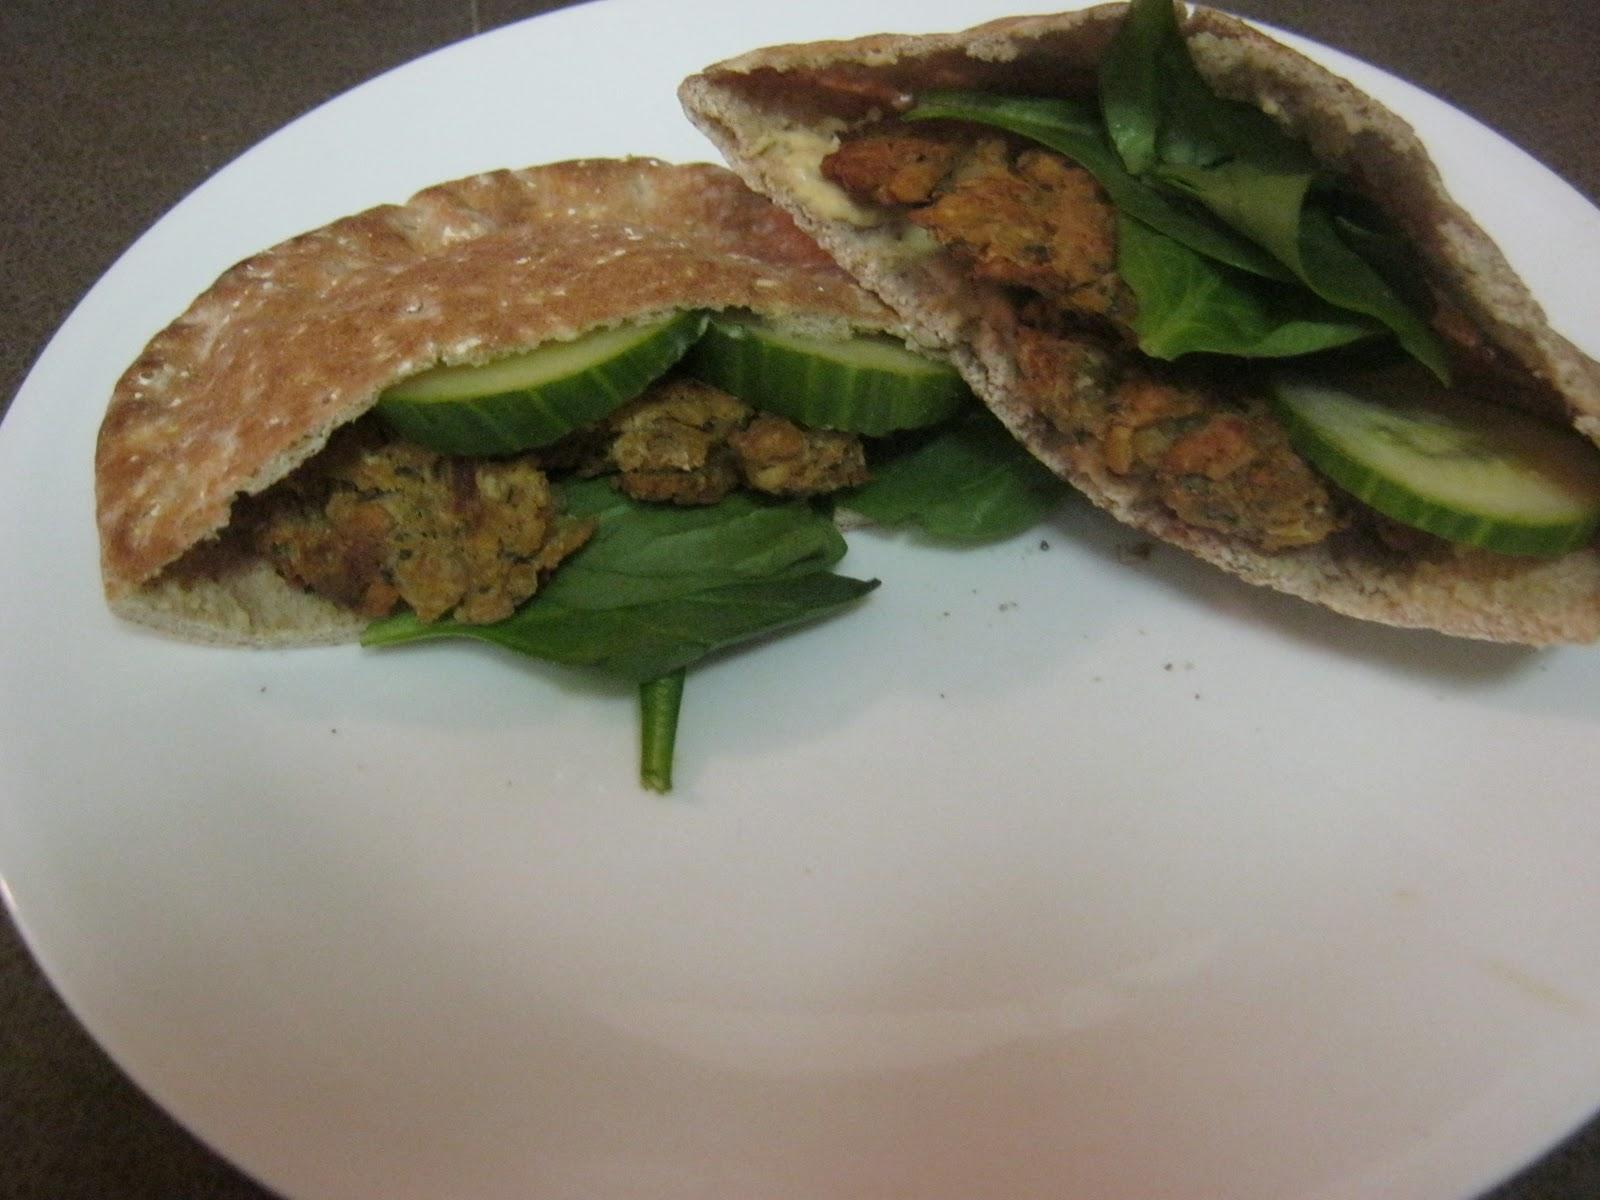 Baked Falafel Pita Sandwich | Fatfree Vegan Recipes